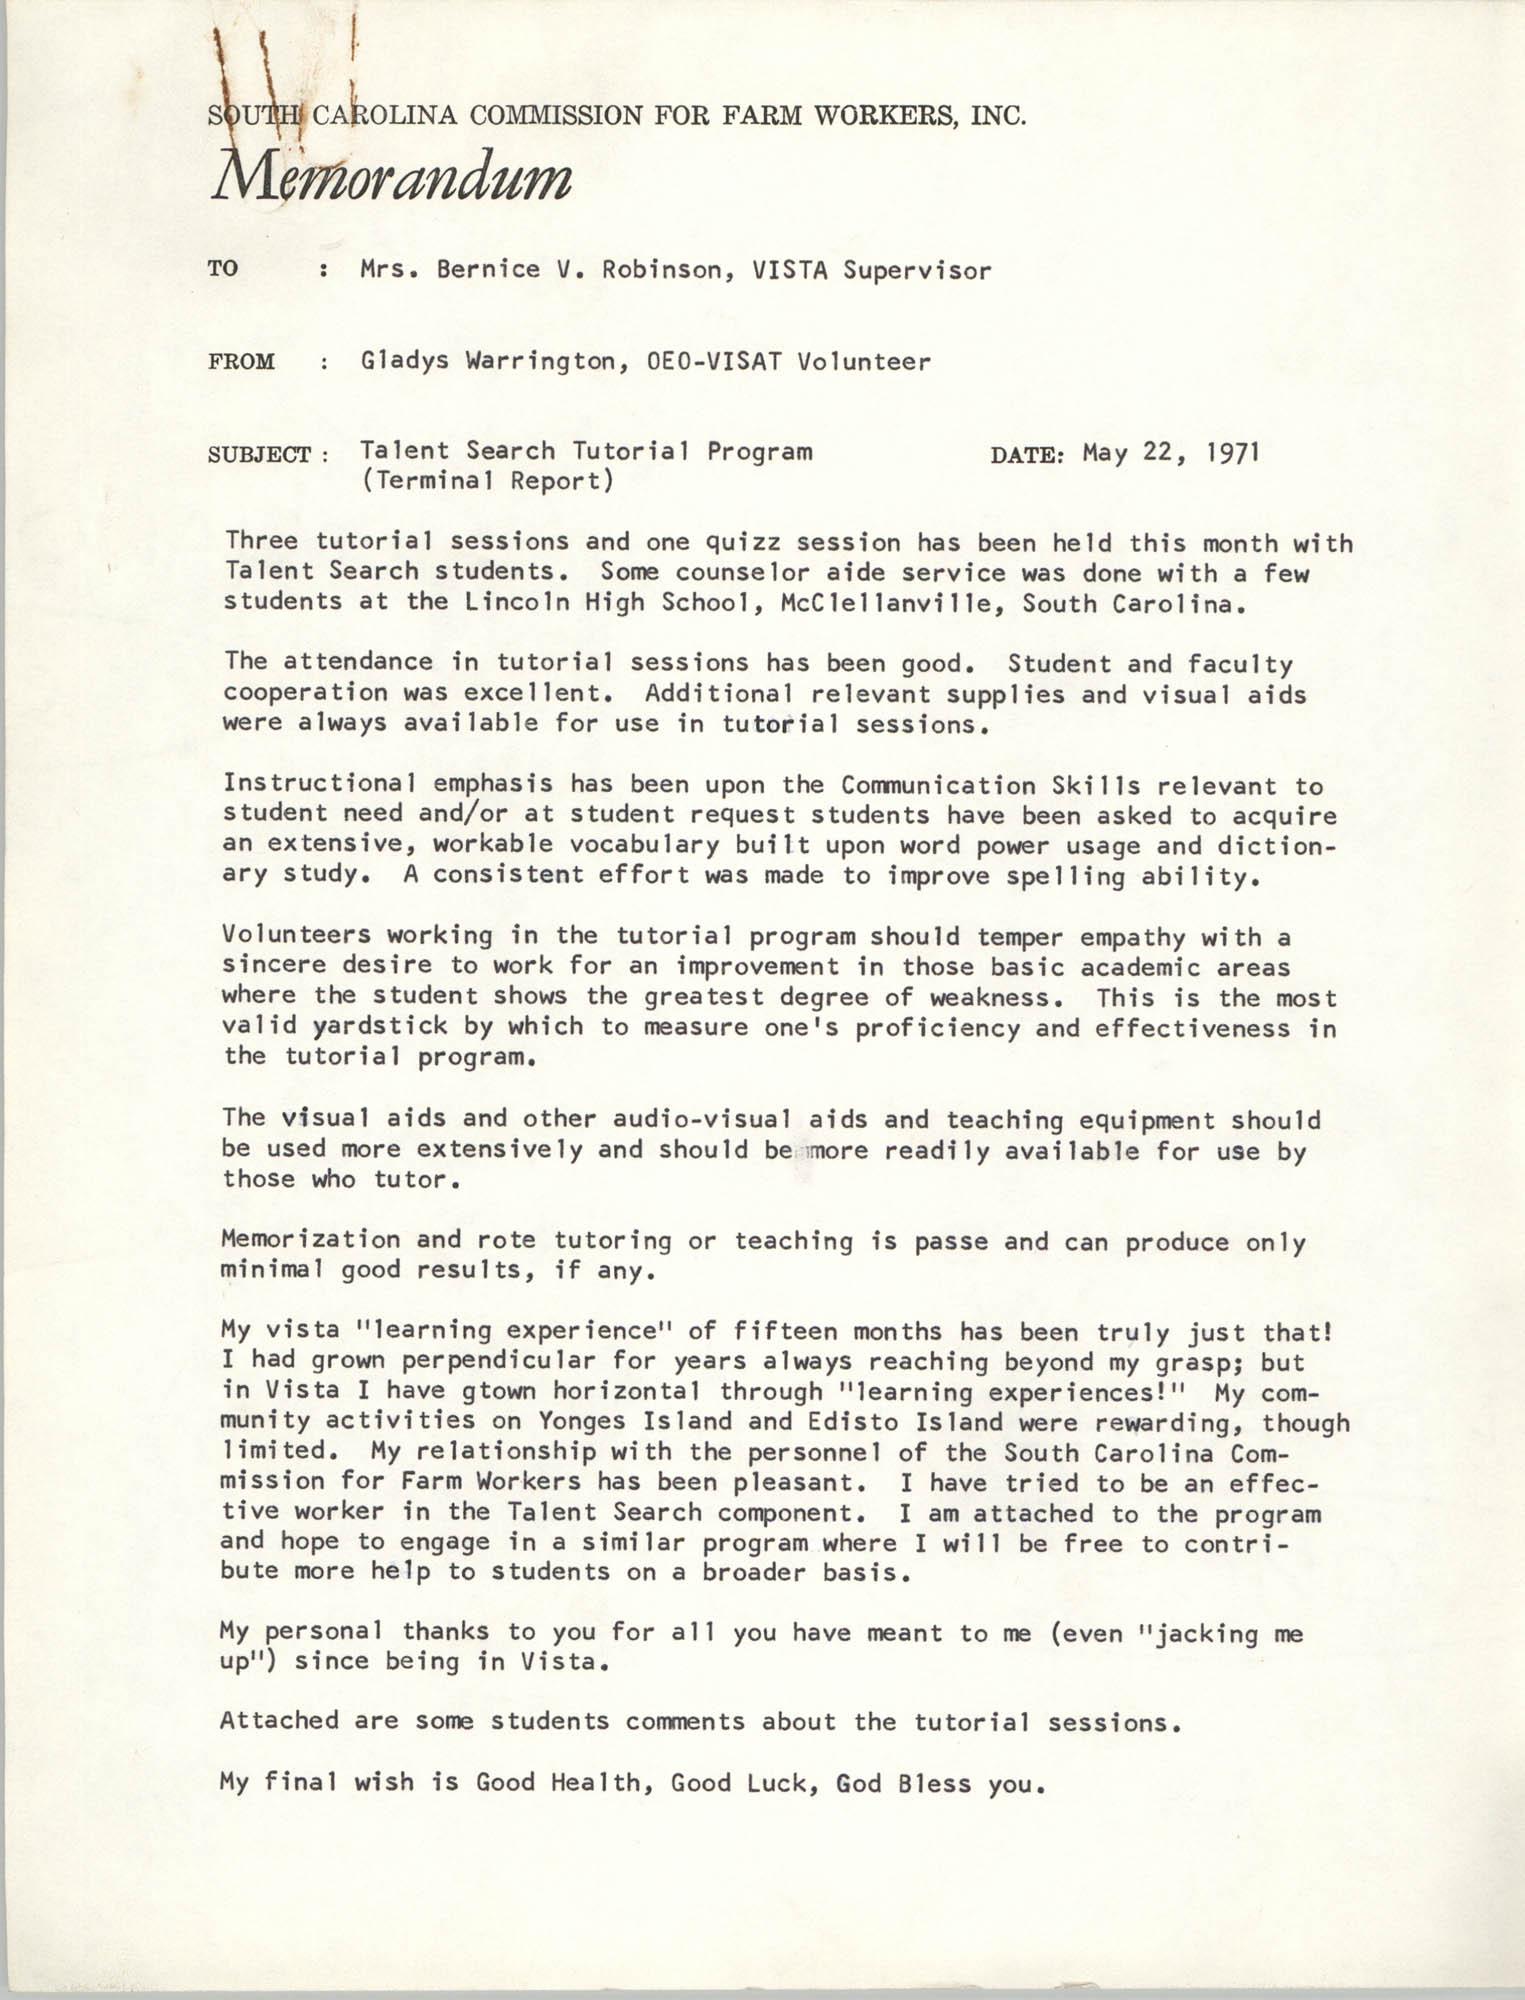 Memorandum from Gladys Warrington to Bernice Robinson, May 1971